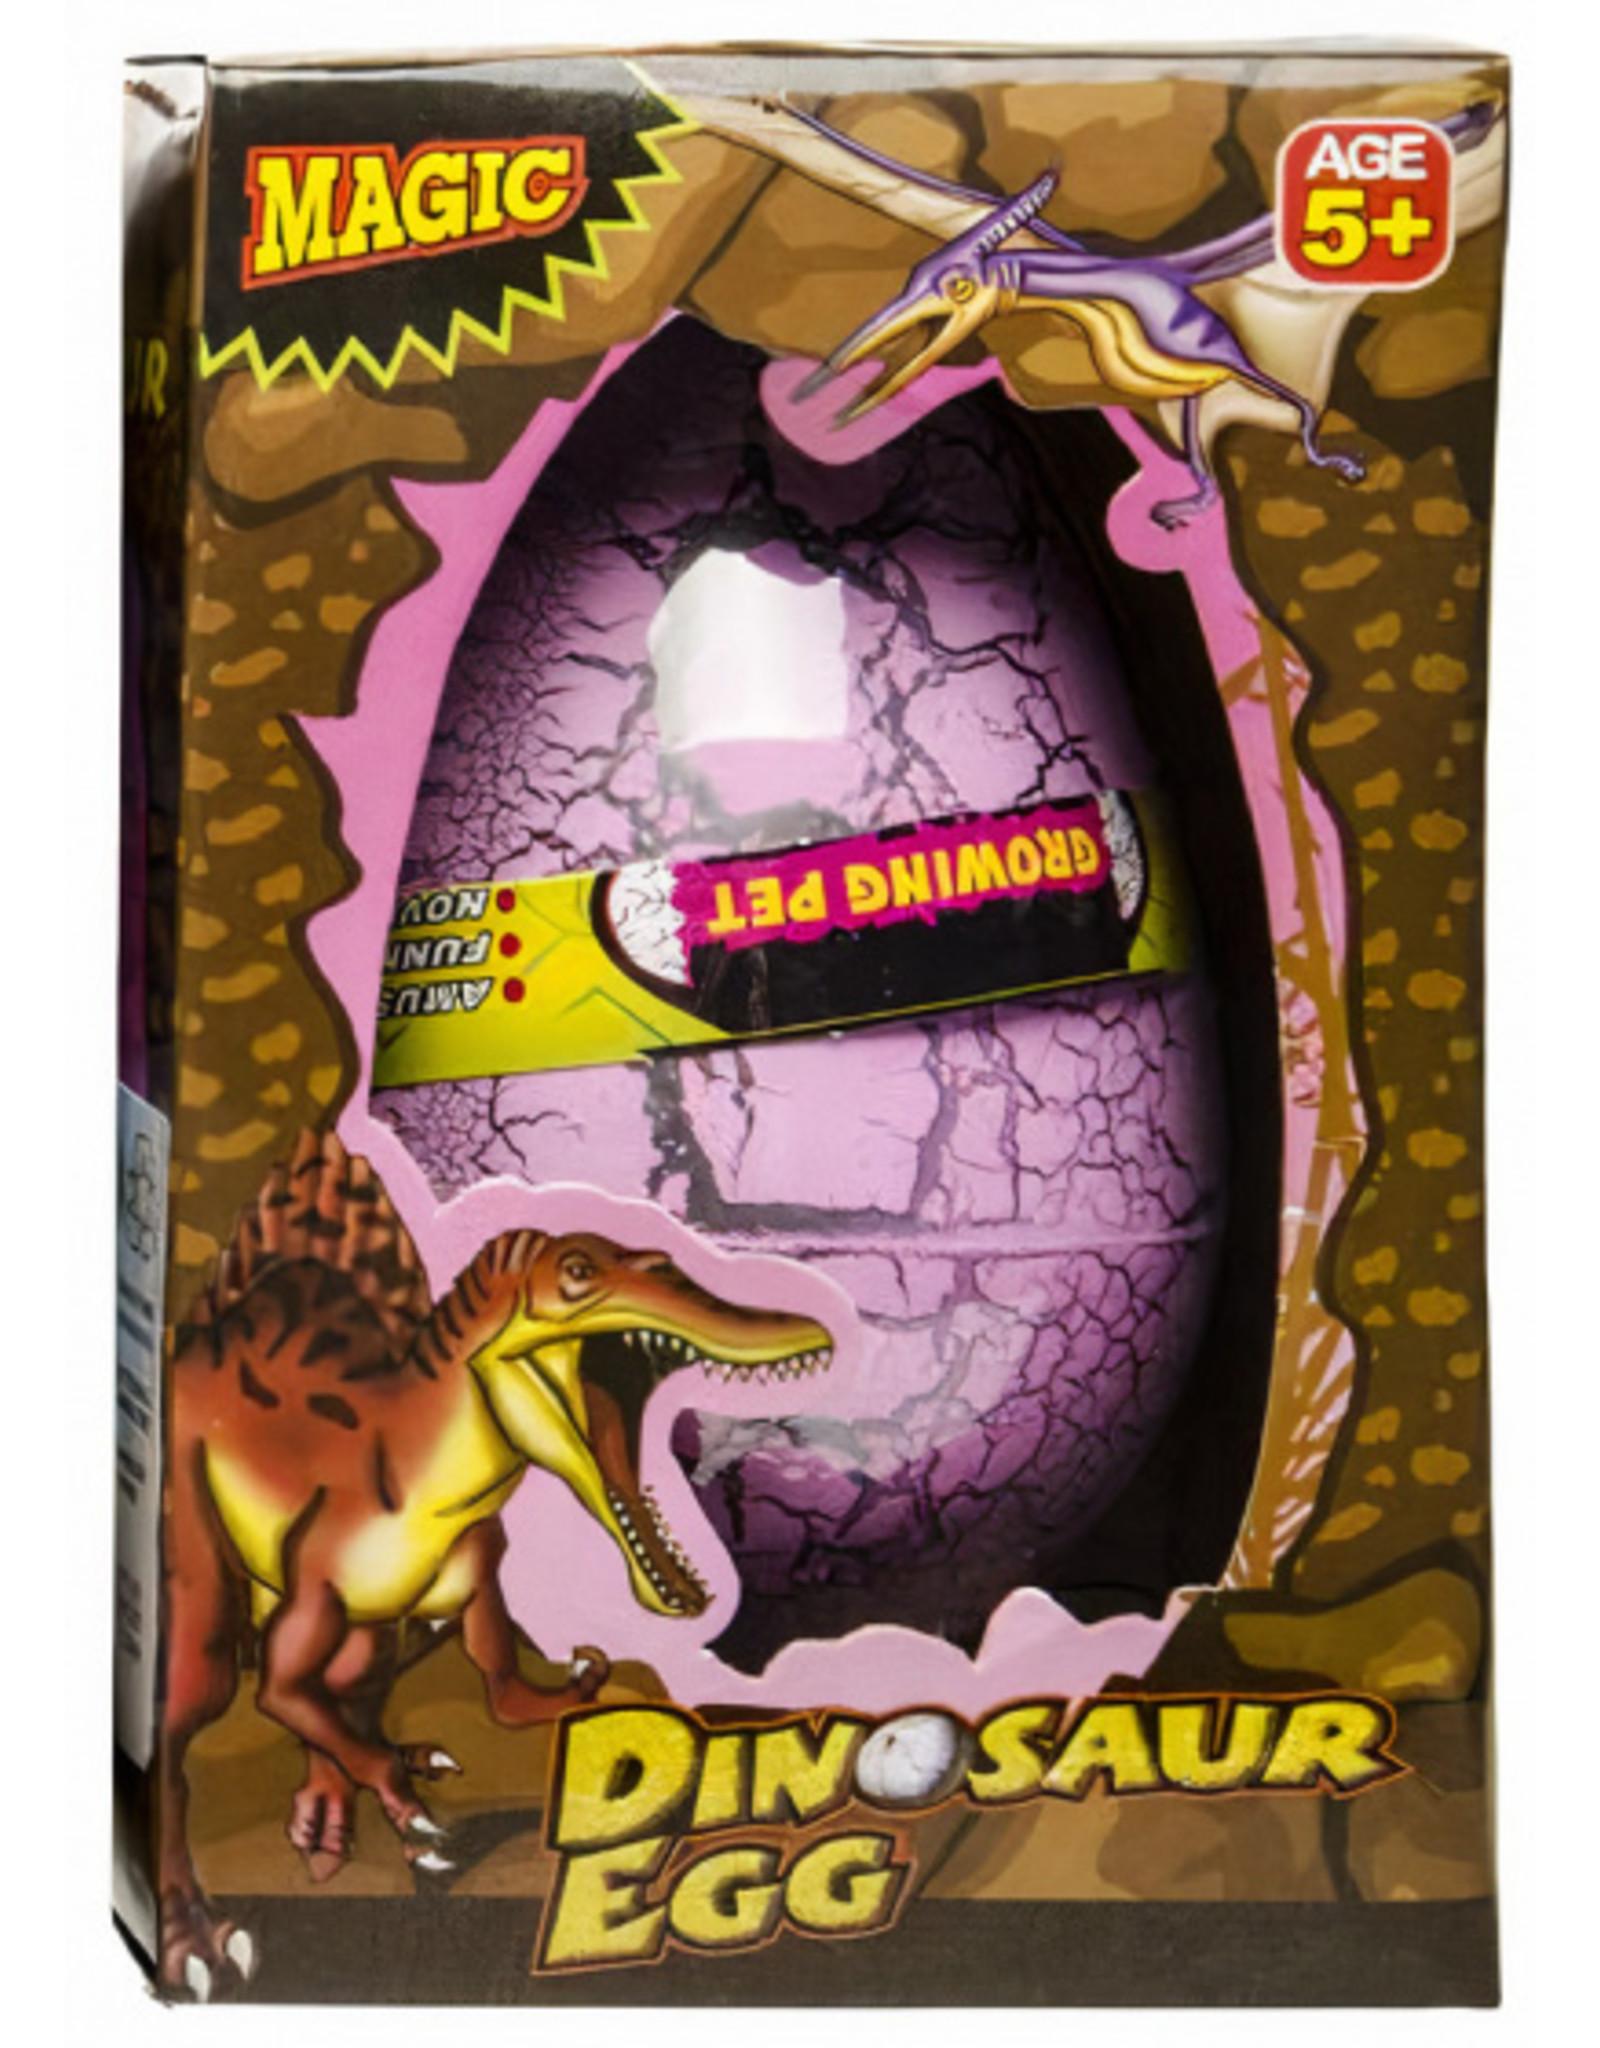 LG-IMPORTS Groei-ei dinosaurus 12 x 6,5 cm roze